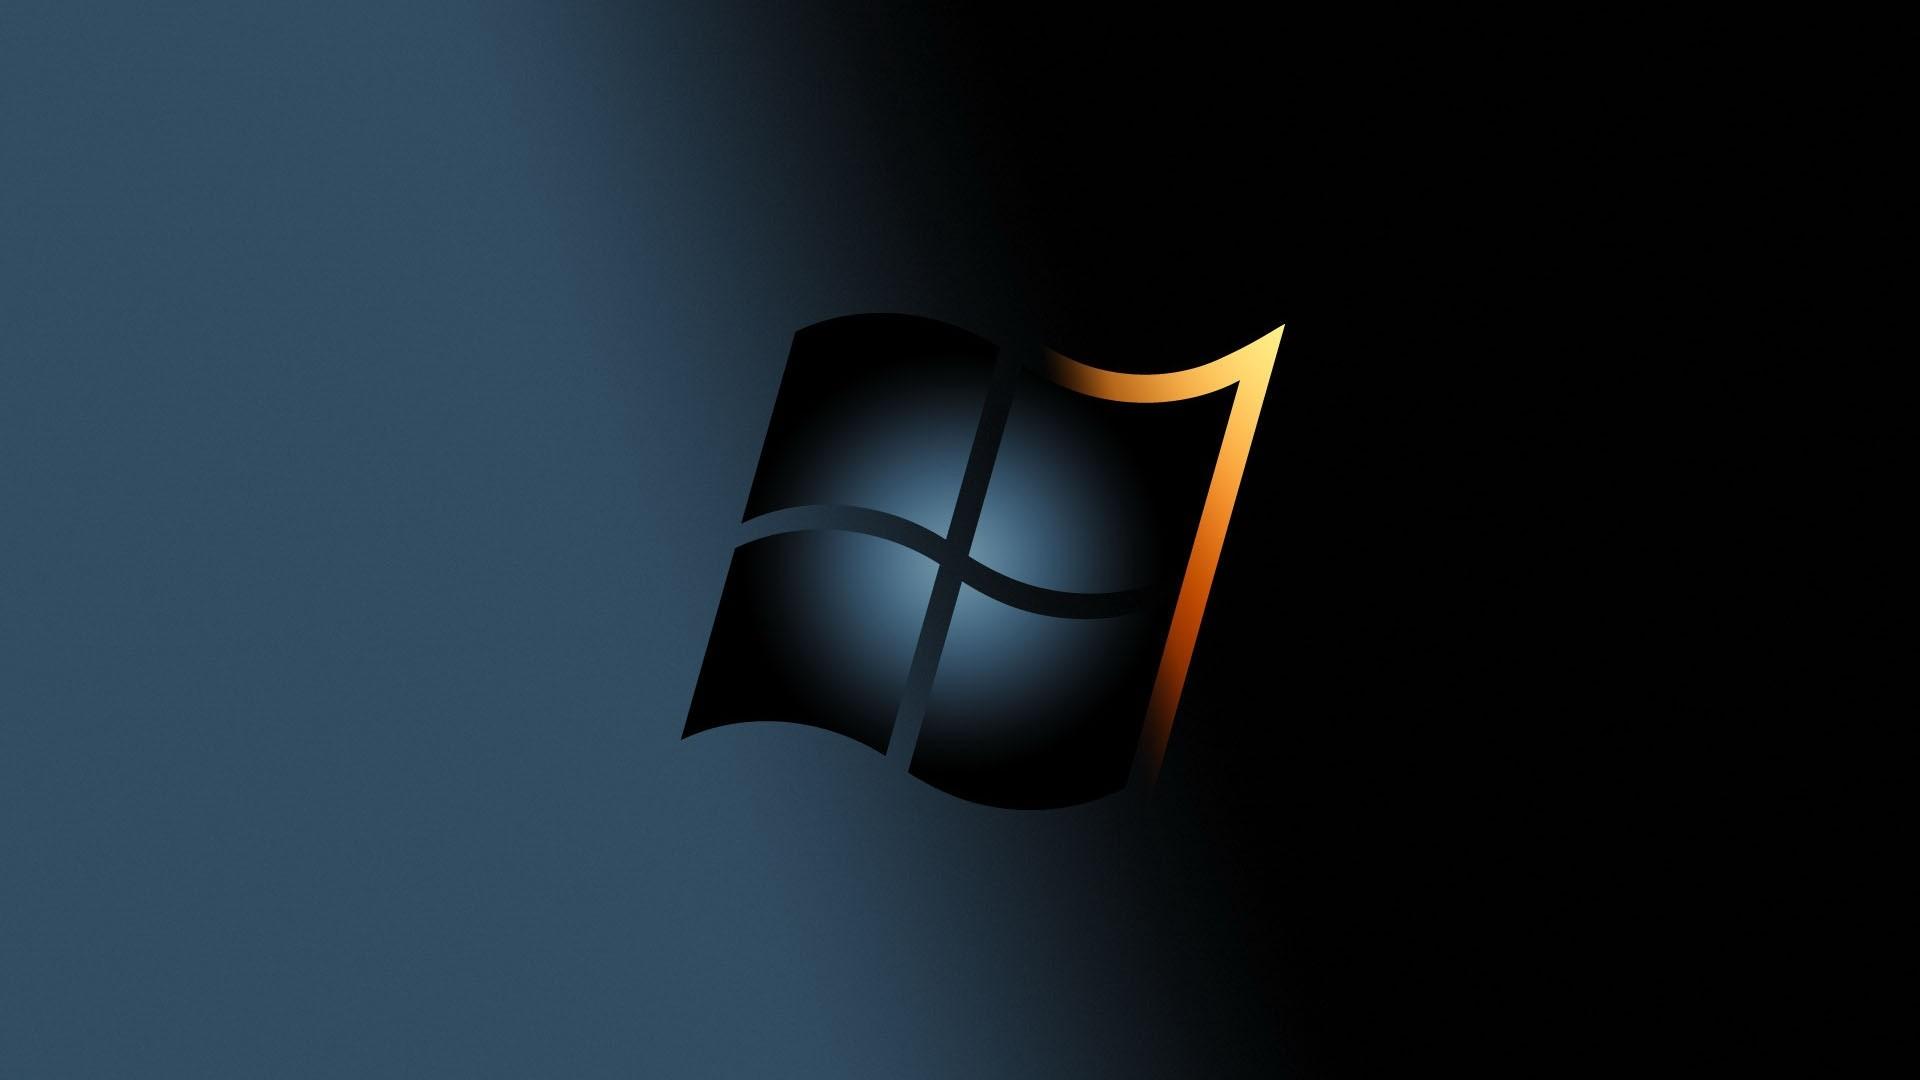 wallpaper screensavers for windows 7 55 images